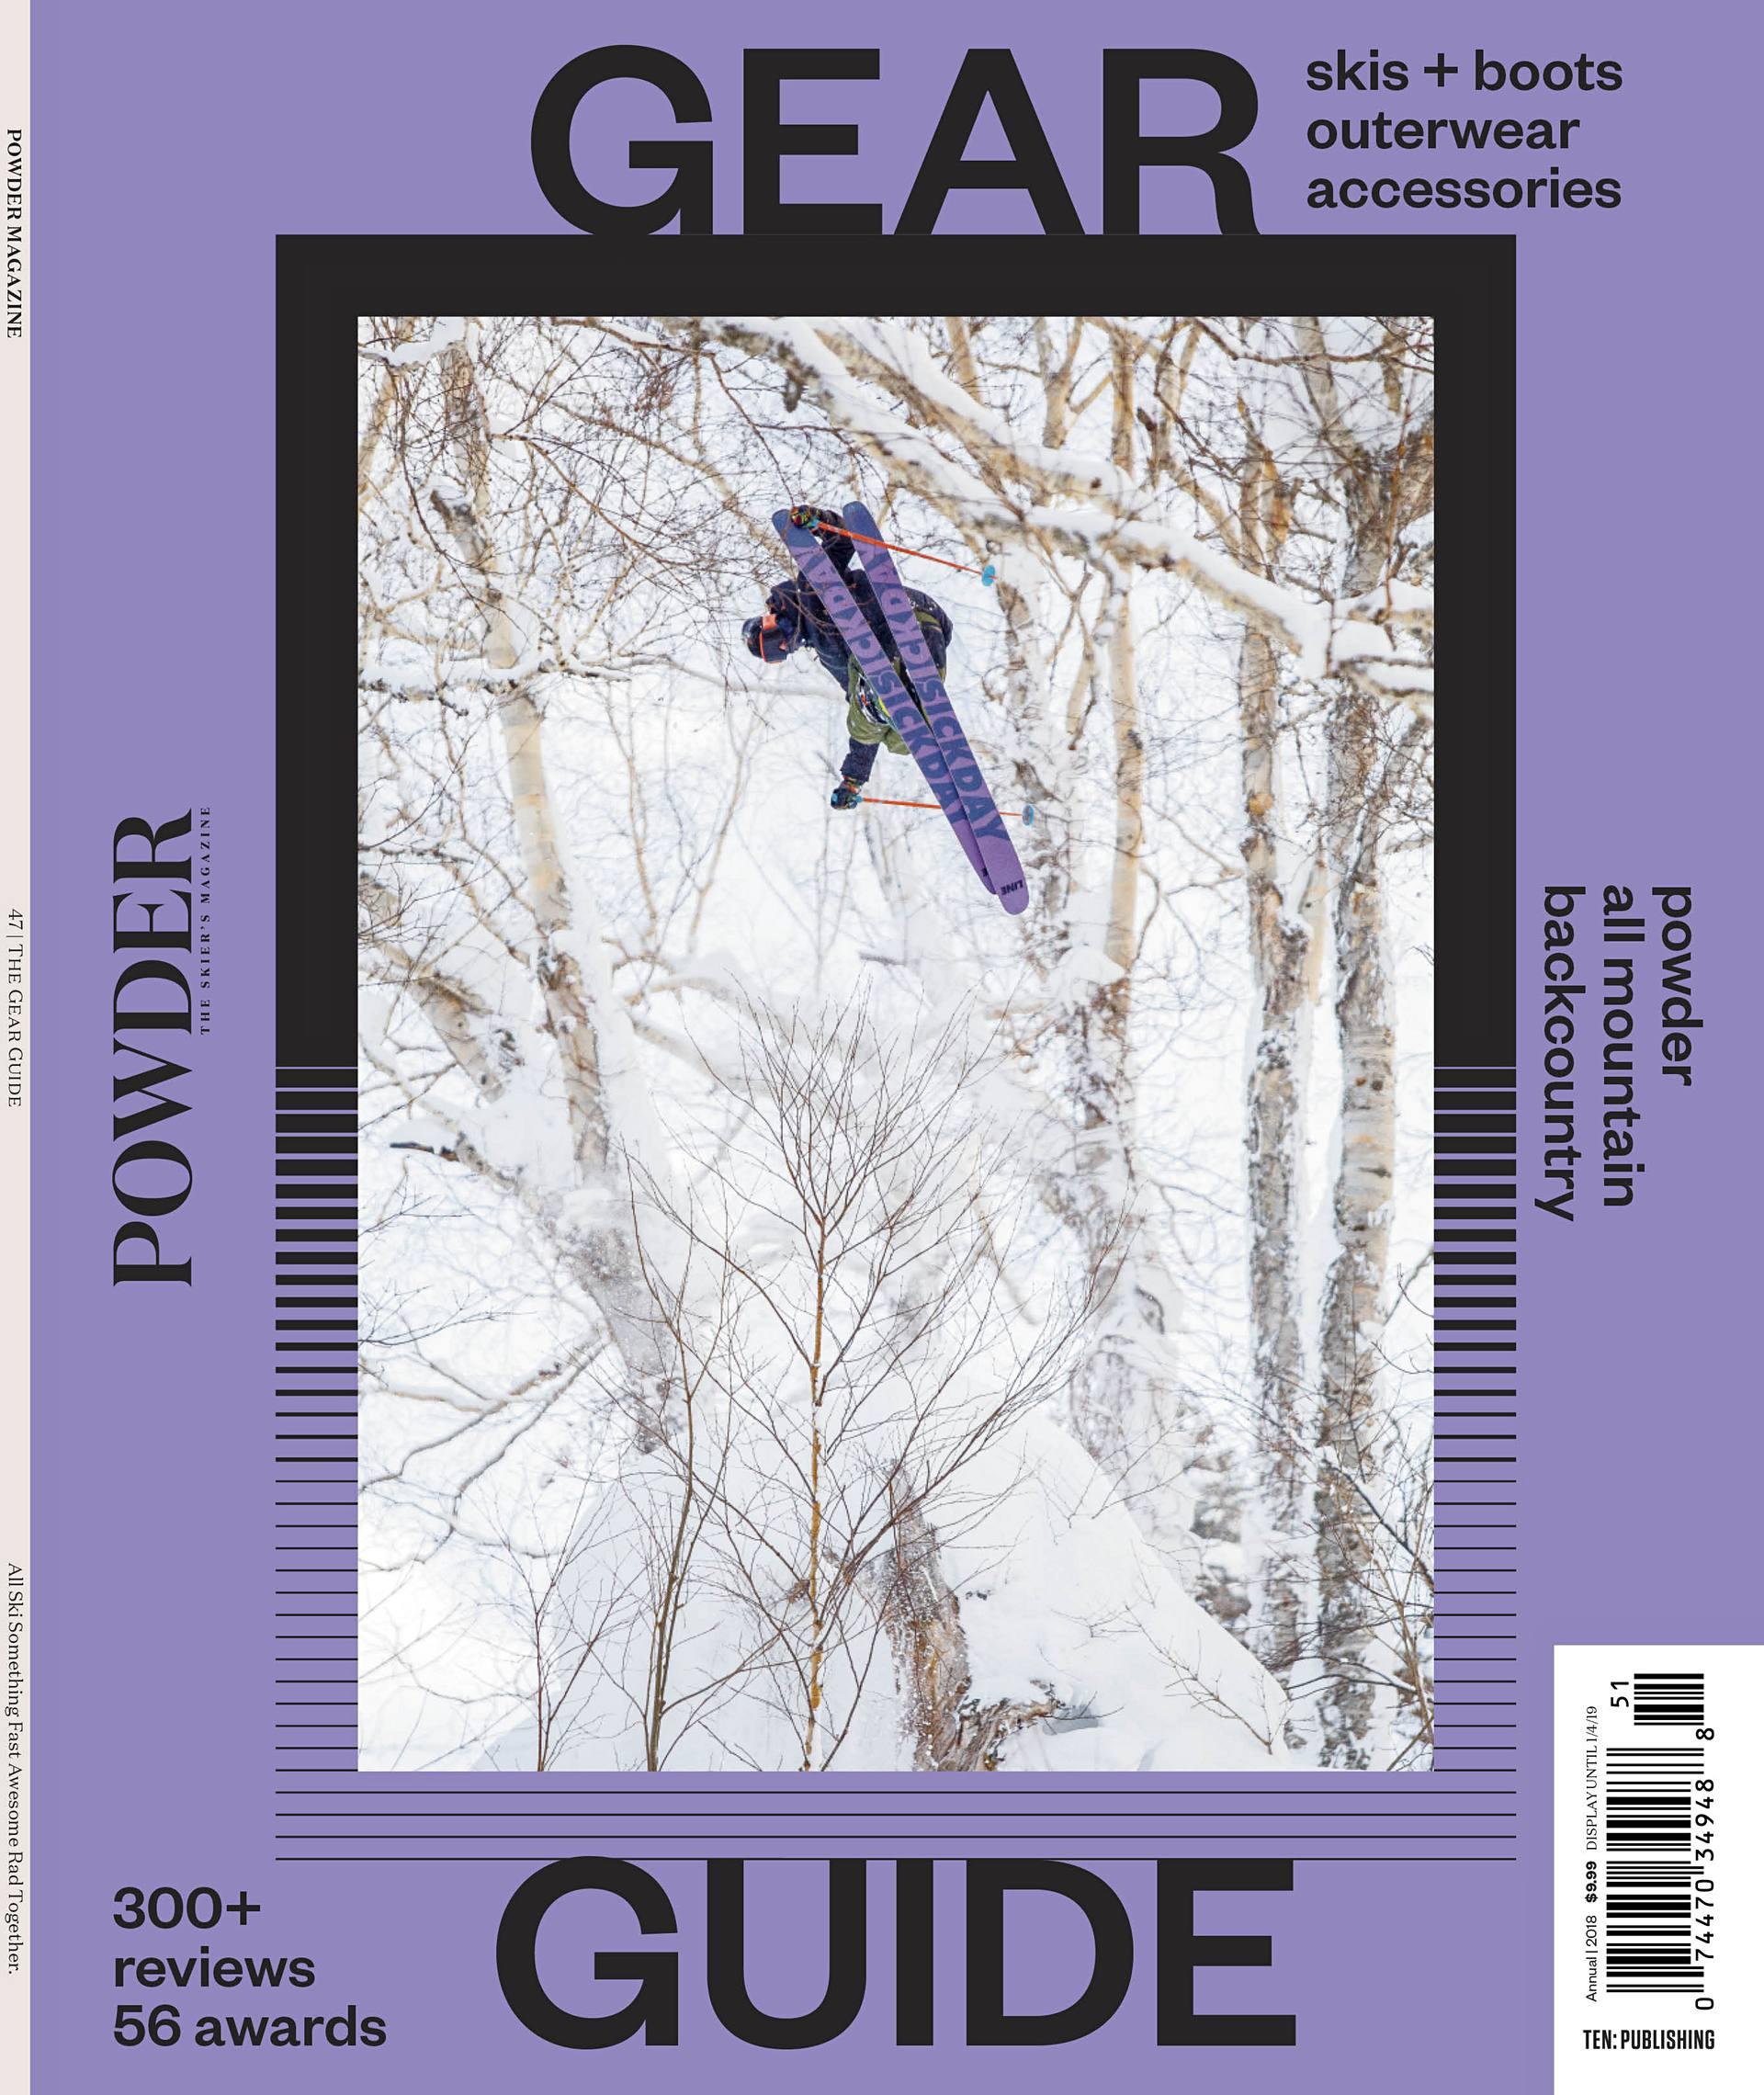 2018_Gear Guide_Powder.jpeg